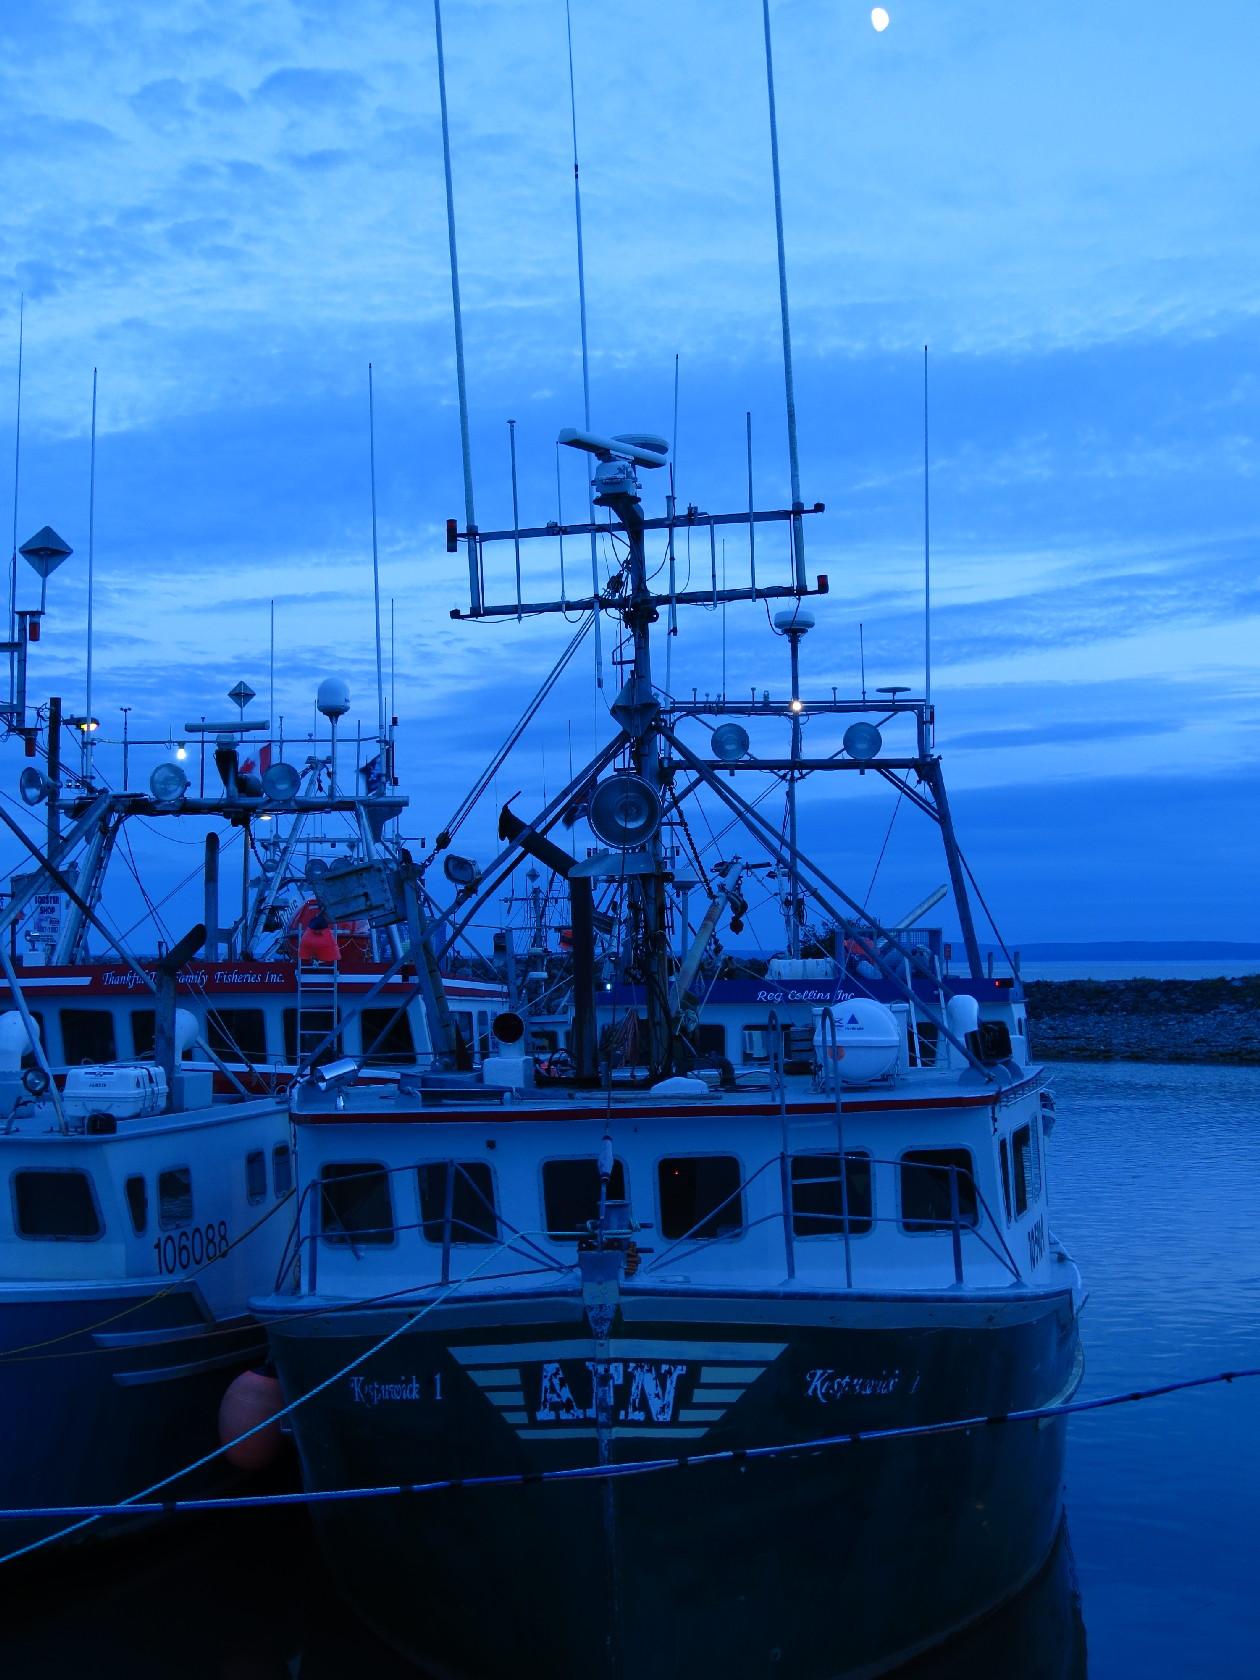 Lobster boats risen as tide comes in, Alma